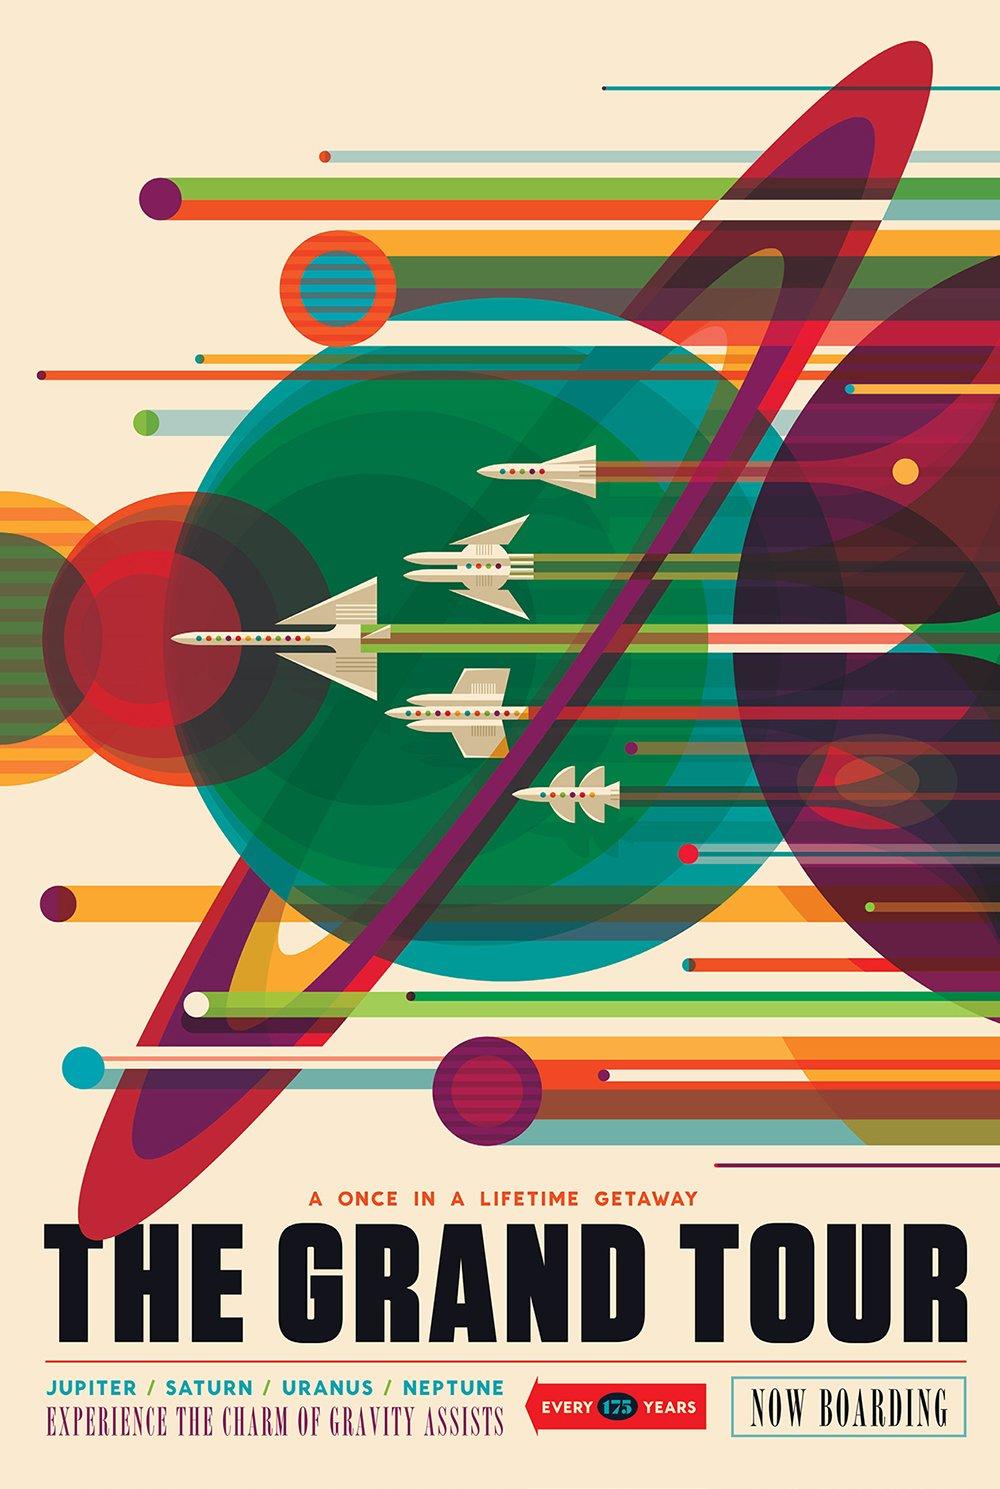 grand_tour-NASA_POSTER-designplayground